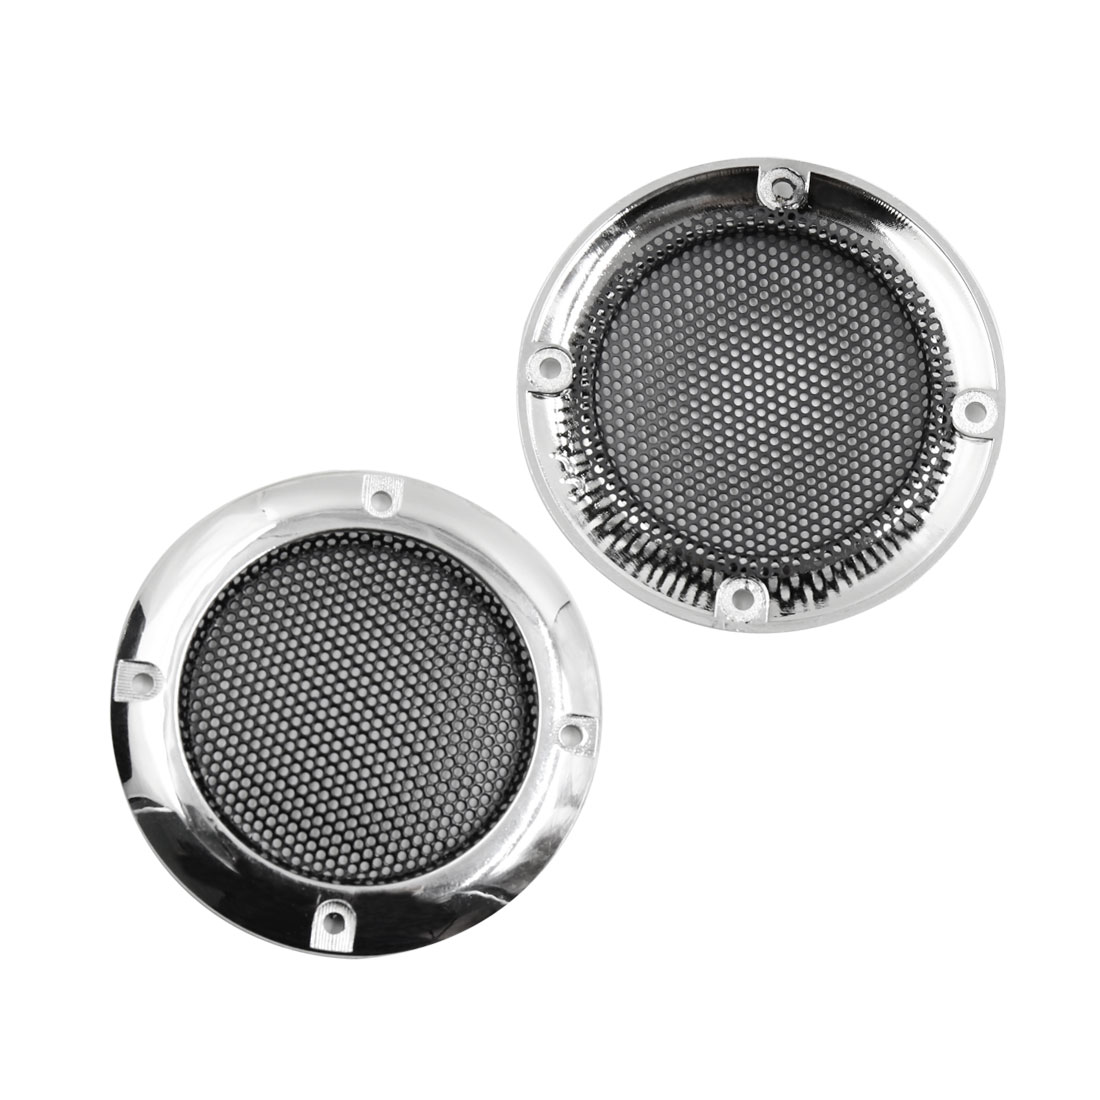 2Pcs 2 Inch Silver Tone Car Audio Woofer Subwoofer Mesh